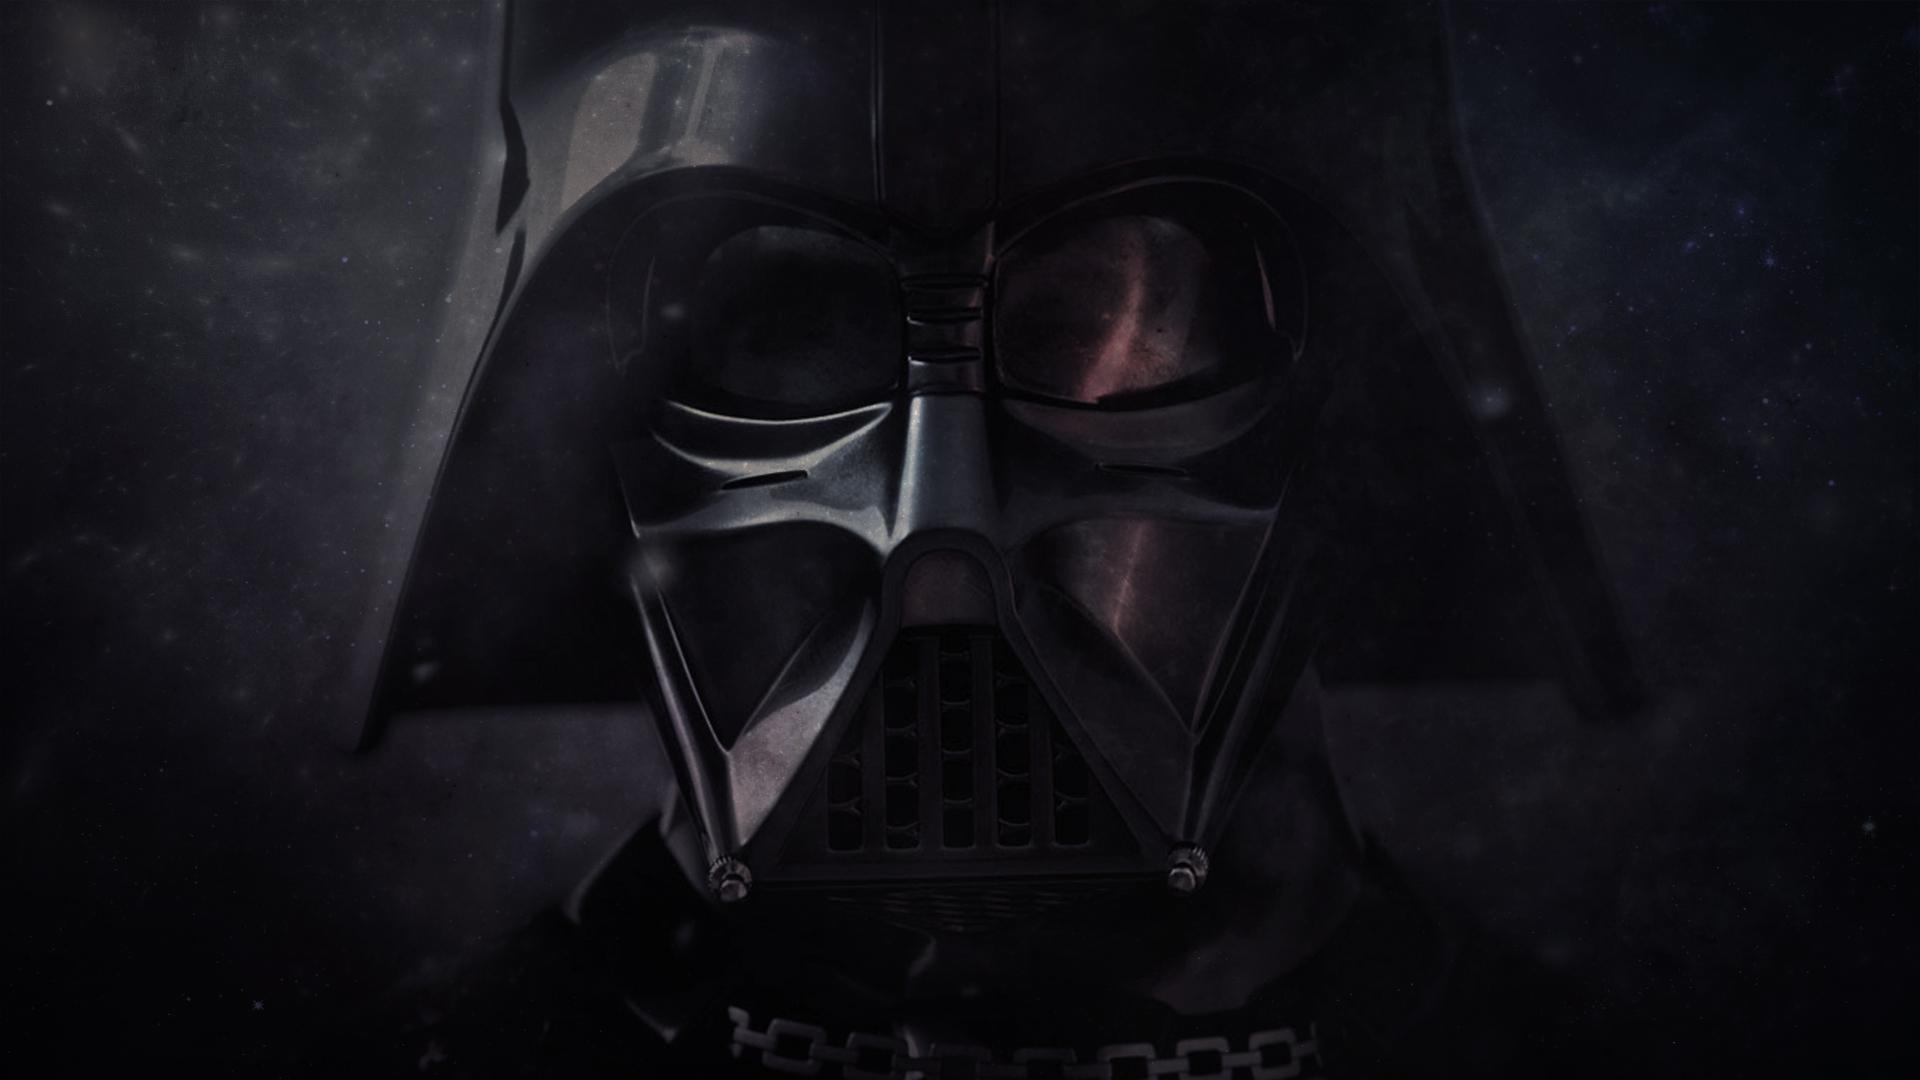 Free Download Wallpaper 1080p Darth Vader By Iamsointense On Deviantart 1920x1080 For Your Desktop Mobile Tablet Explore 47 Star Wars 1080p Wallpaper Star Wars Background Wallpaper Free Star Wars